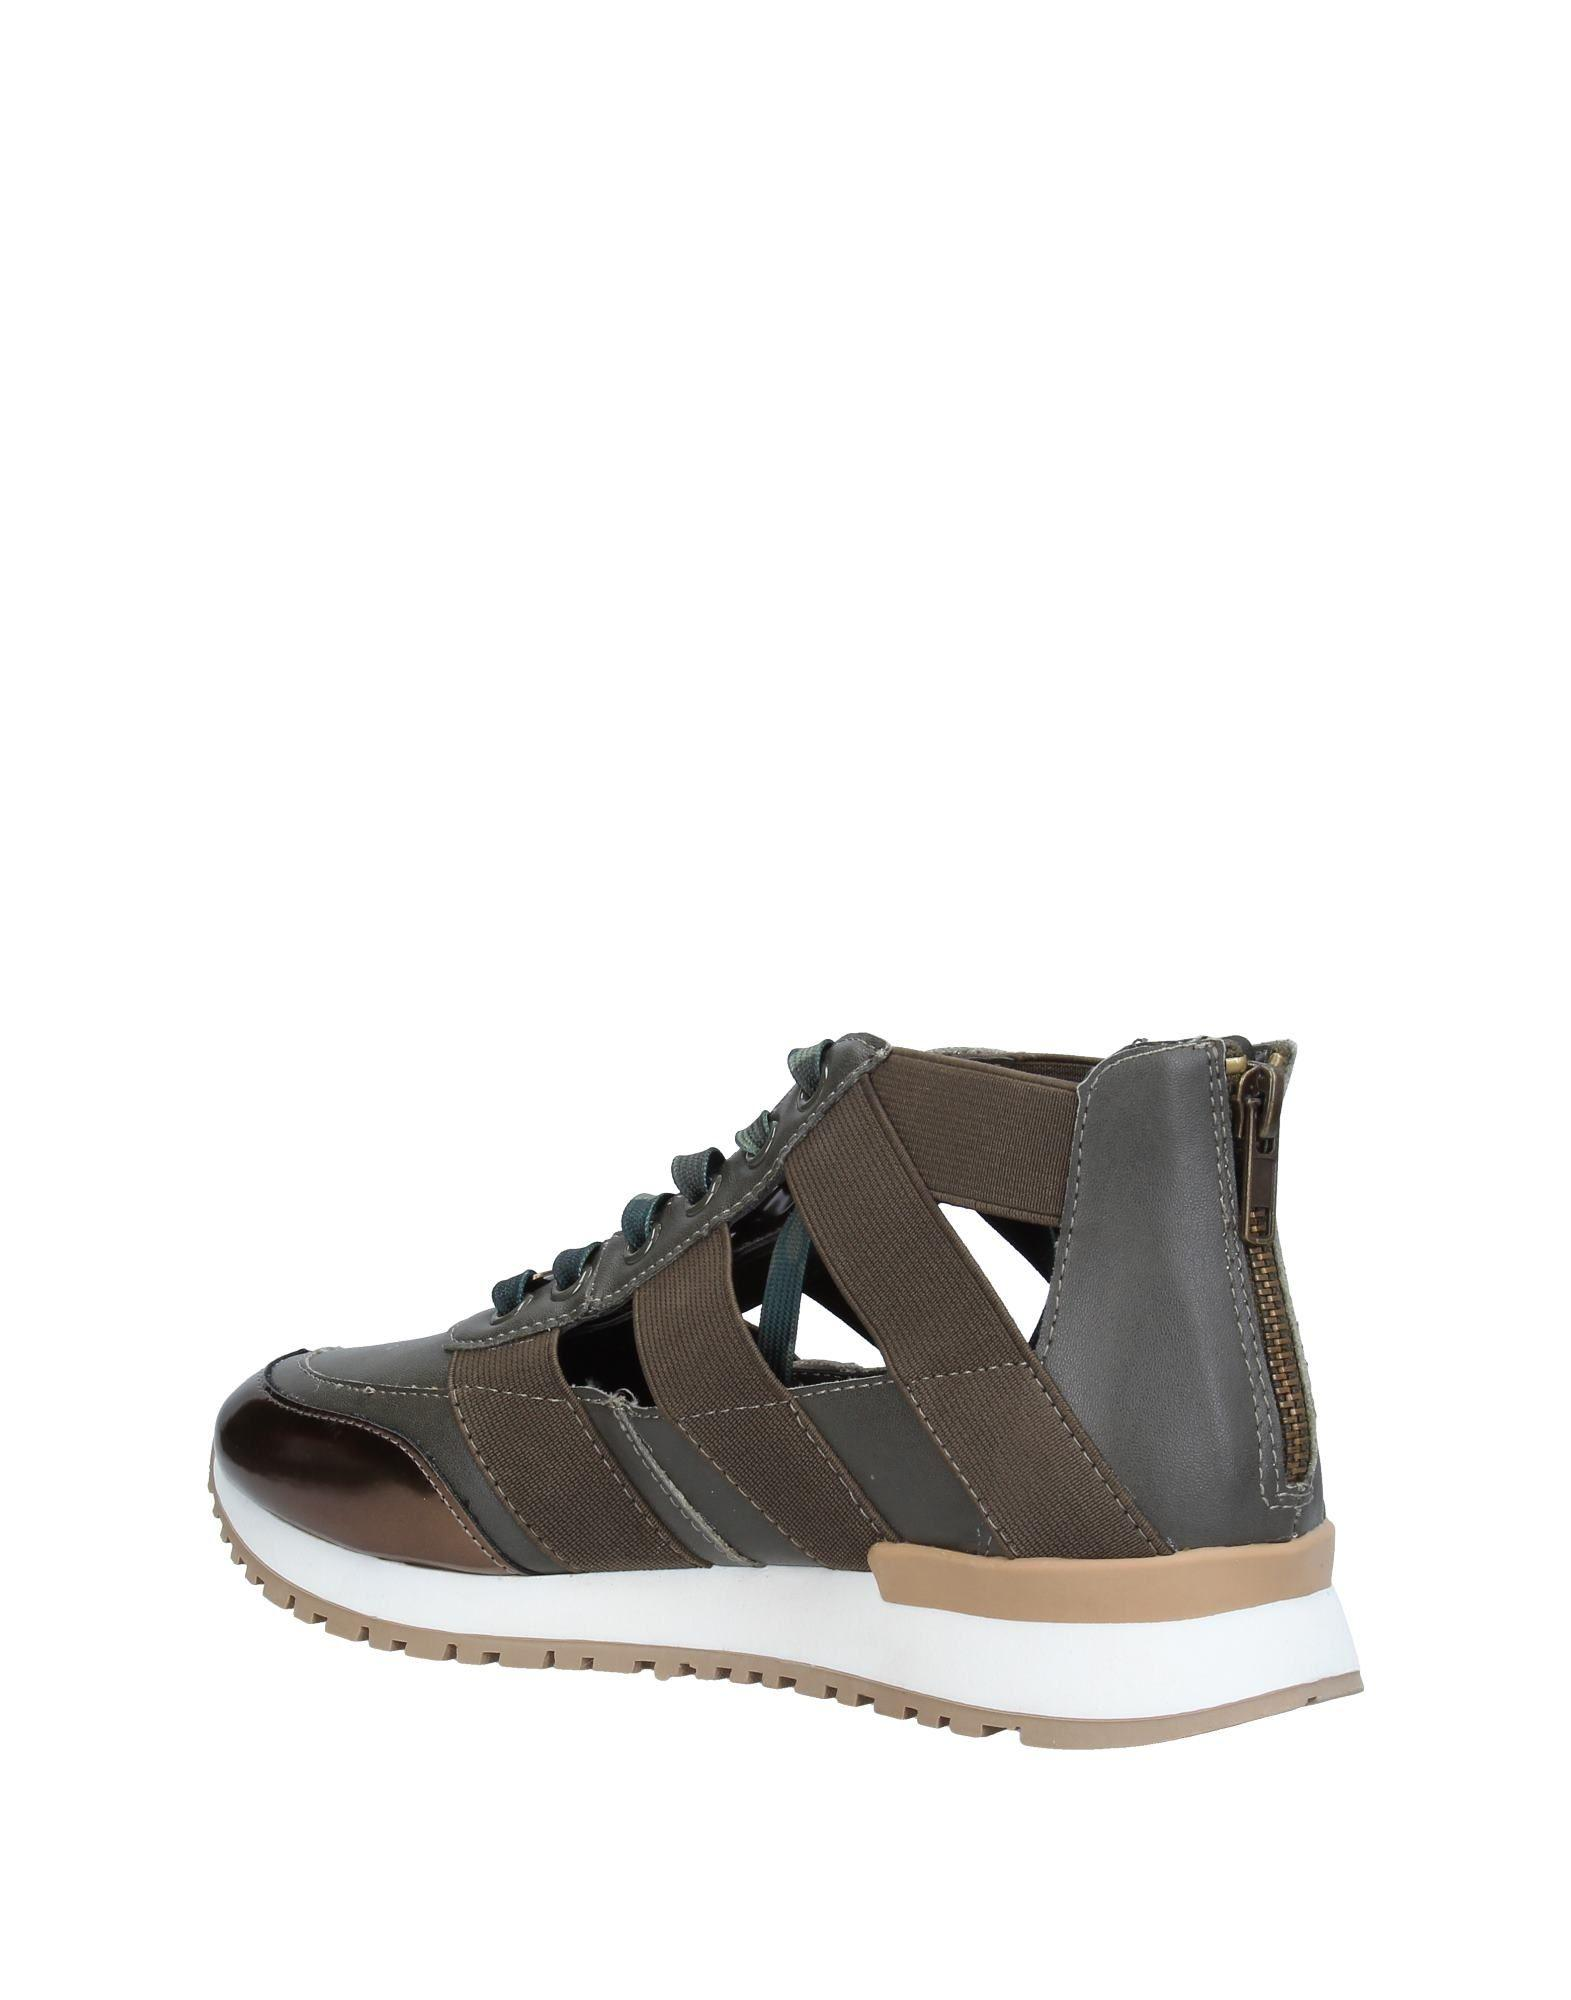 Steve Madden Low-tops & Sneakers in Dark Green (Green)